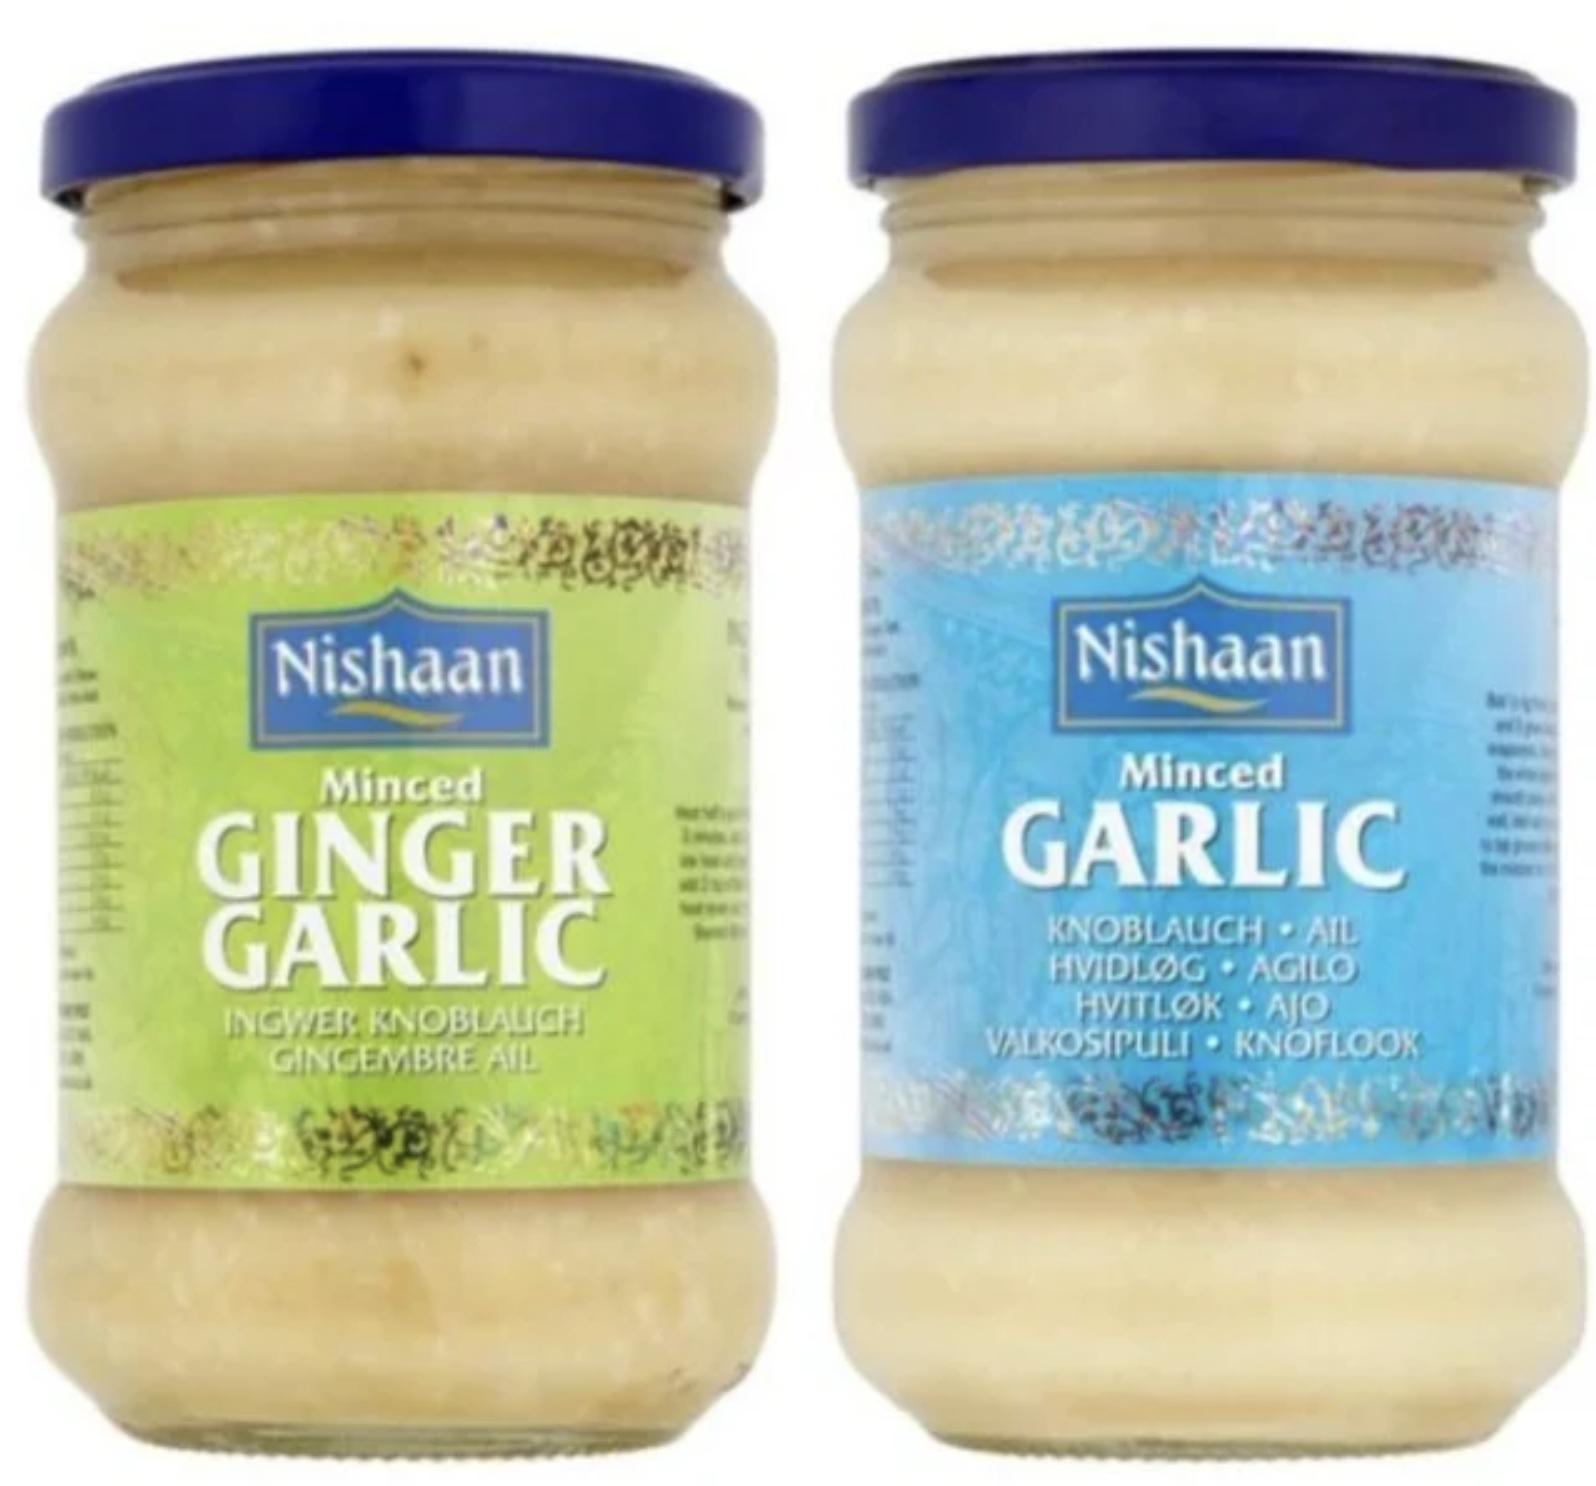 Nishaan Garlic Paste 283G,Nishaan Ginger Garlic Paste 283G Each - 90p (Clubcard Price) @ Tesco